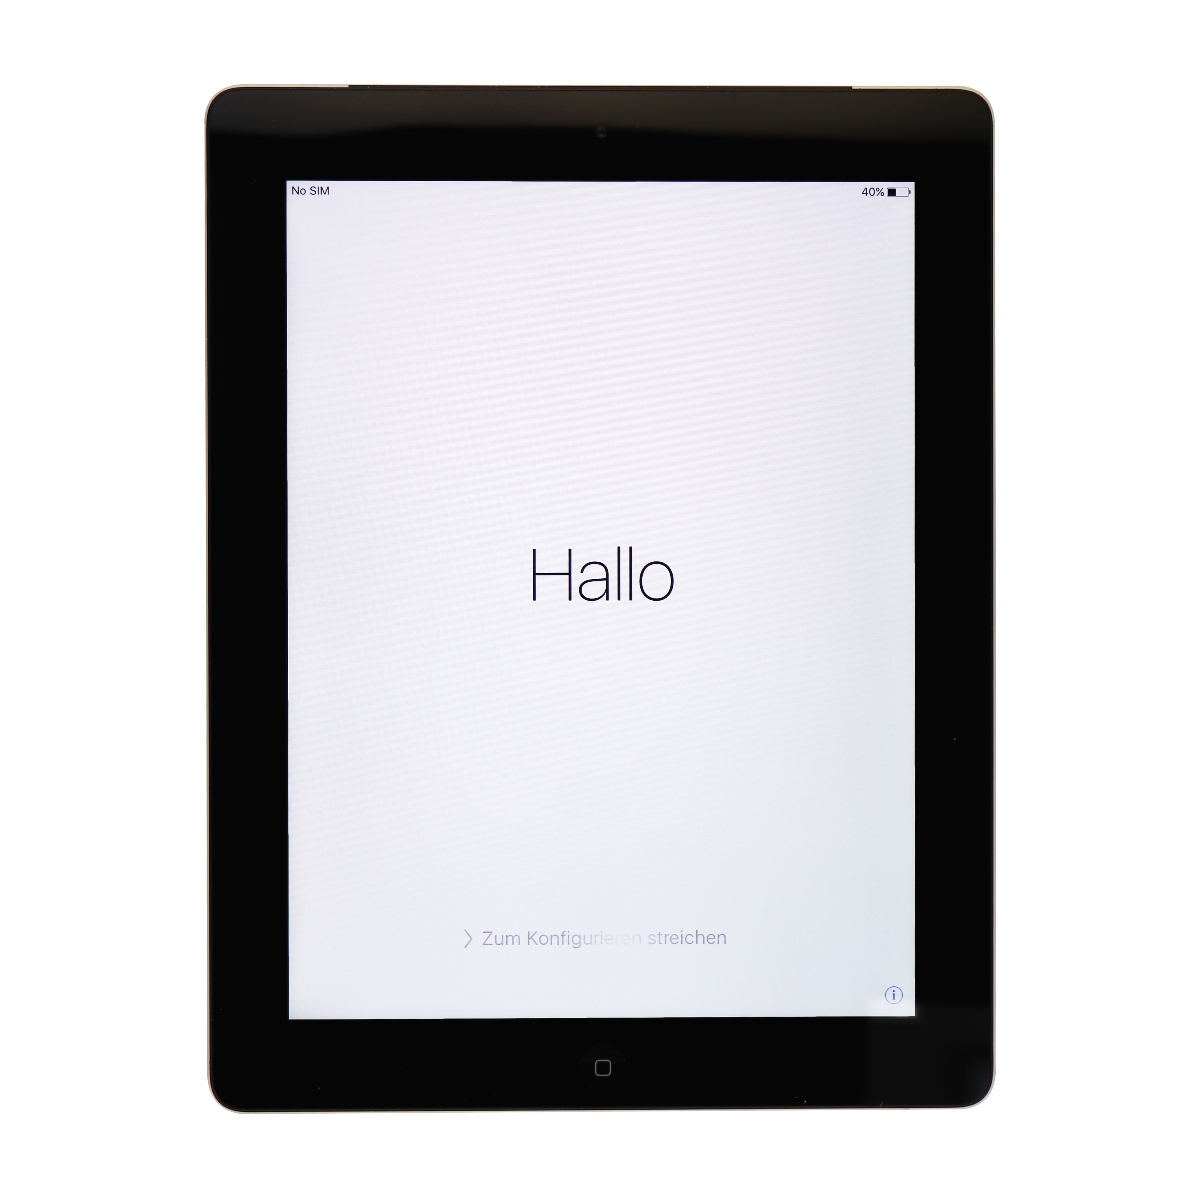 Apple iPad 3rd Generation A1403 (Verizon Wireless) 4G LTE Tablet 16GB Black